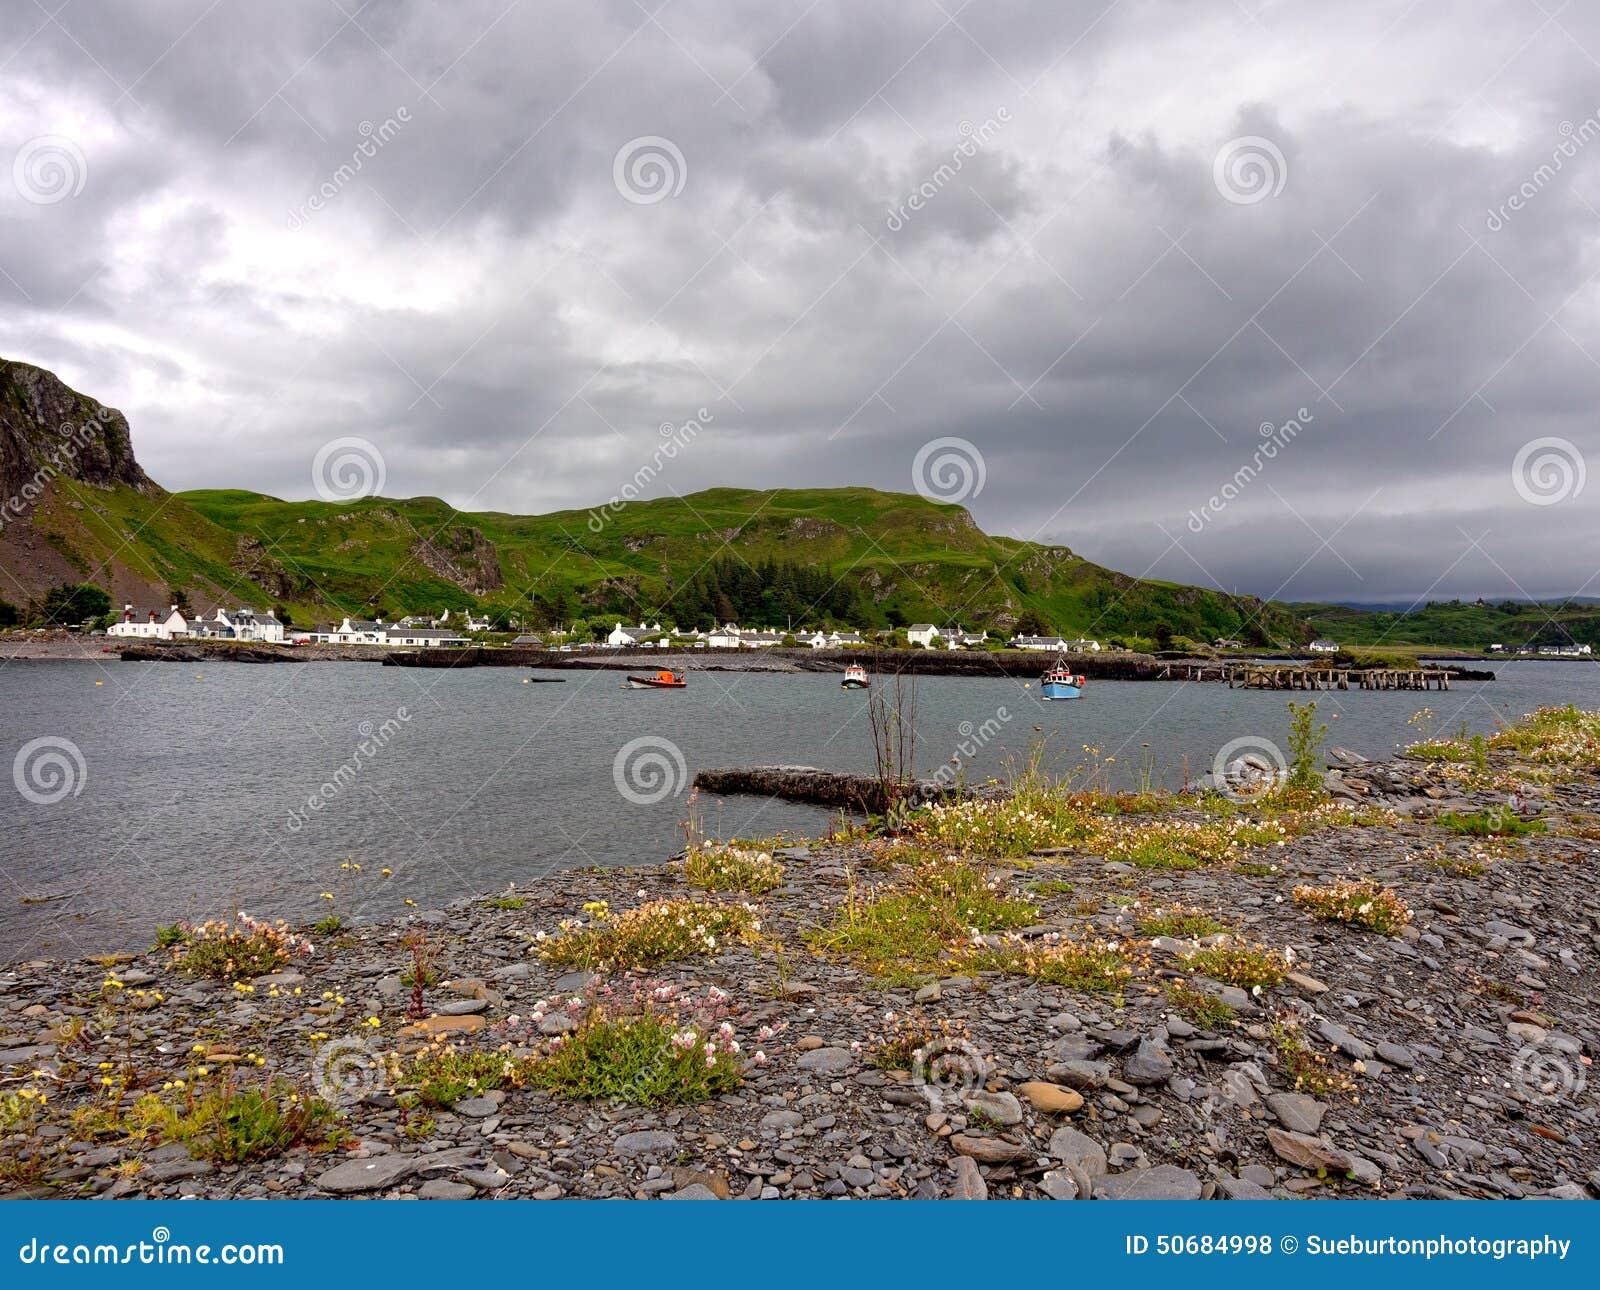 Download 伊斯代尔岛海岛海岸 库存照片. 图片 包括有 海岛, 猎物, 轮渡, 板岩, hebrides, 苏格兰 - 50684998